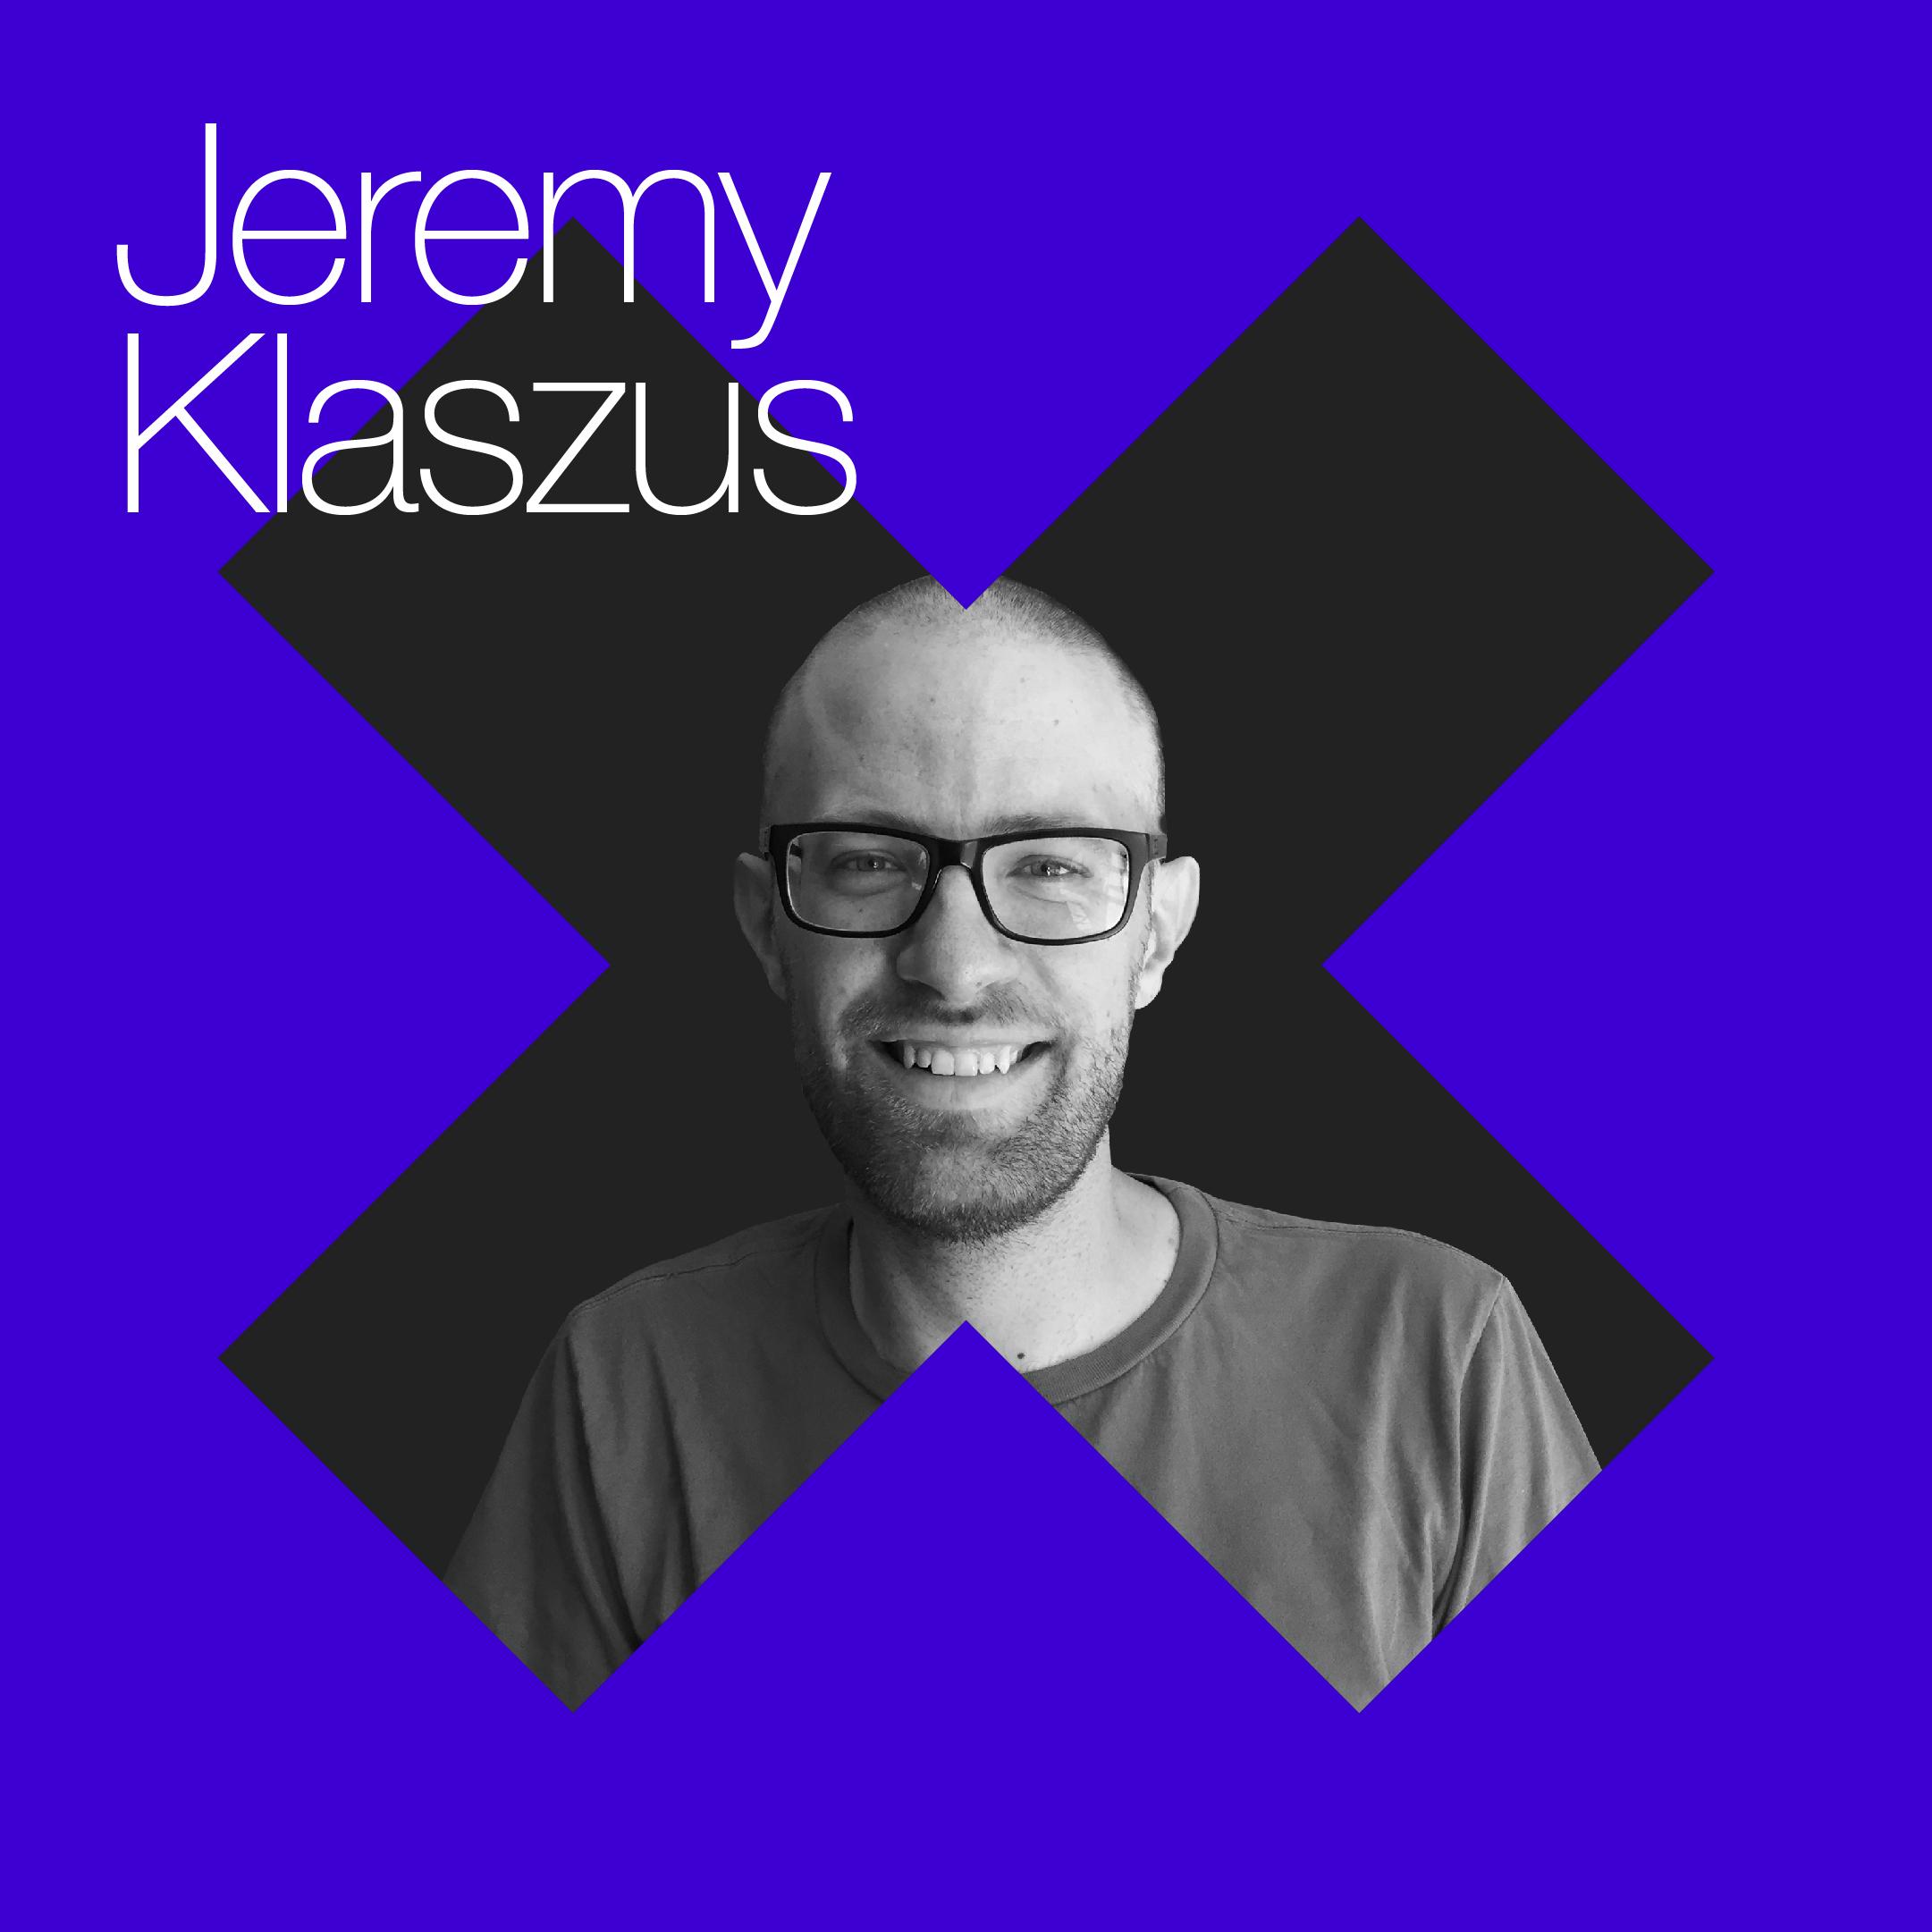 Jeremy Klaszus | The Case for Quiet Journalism